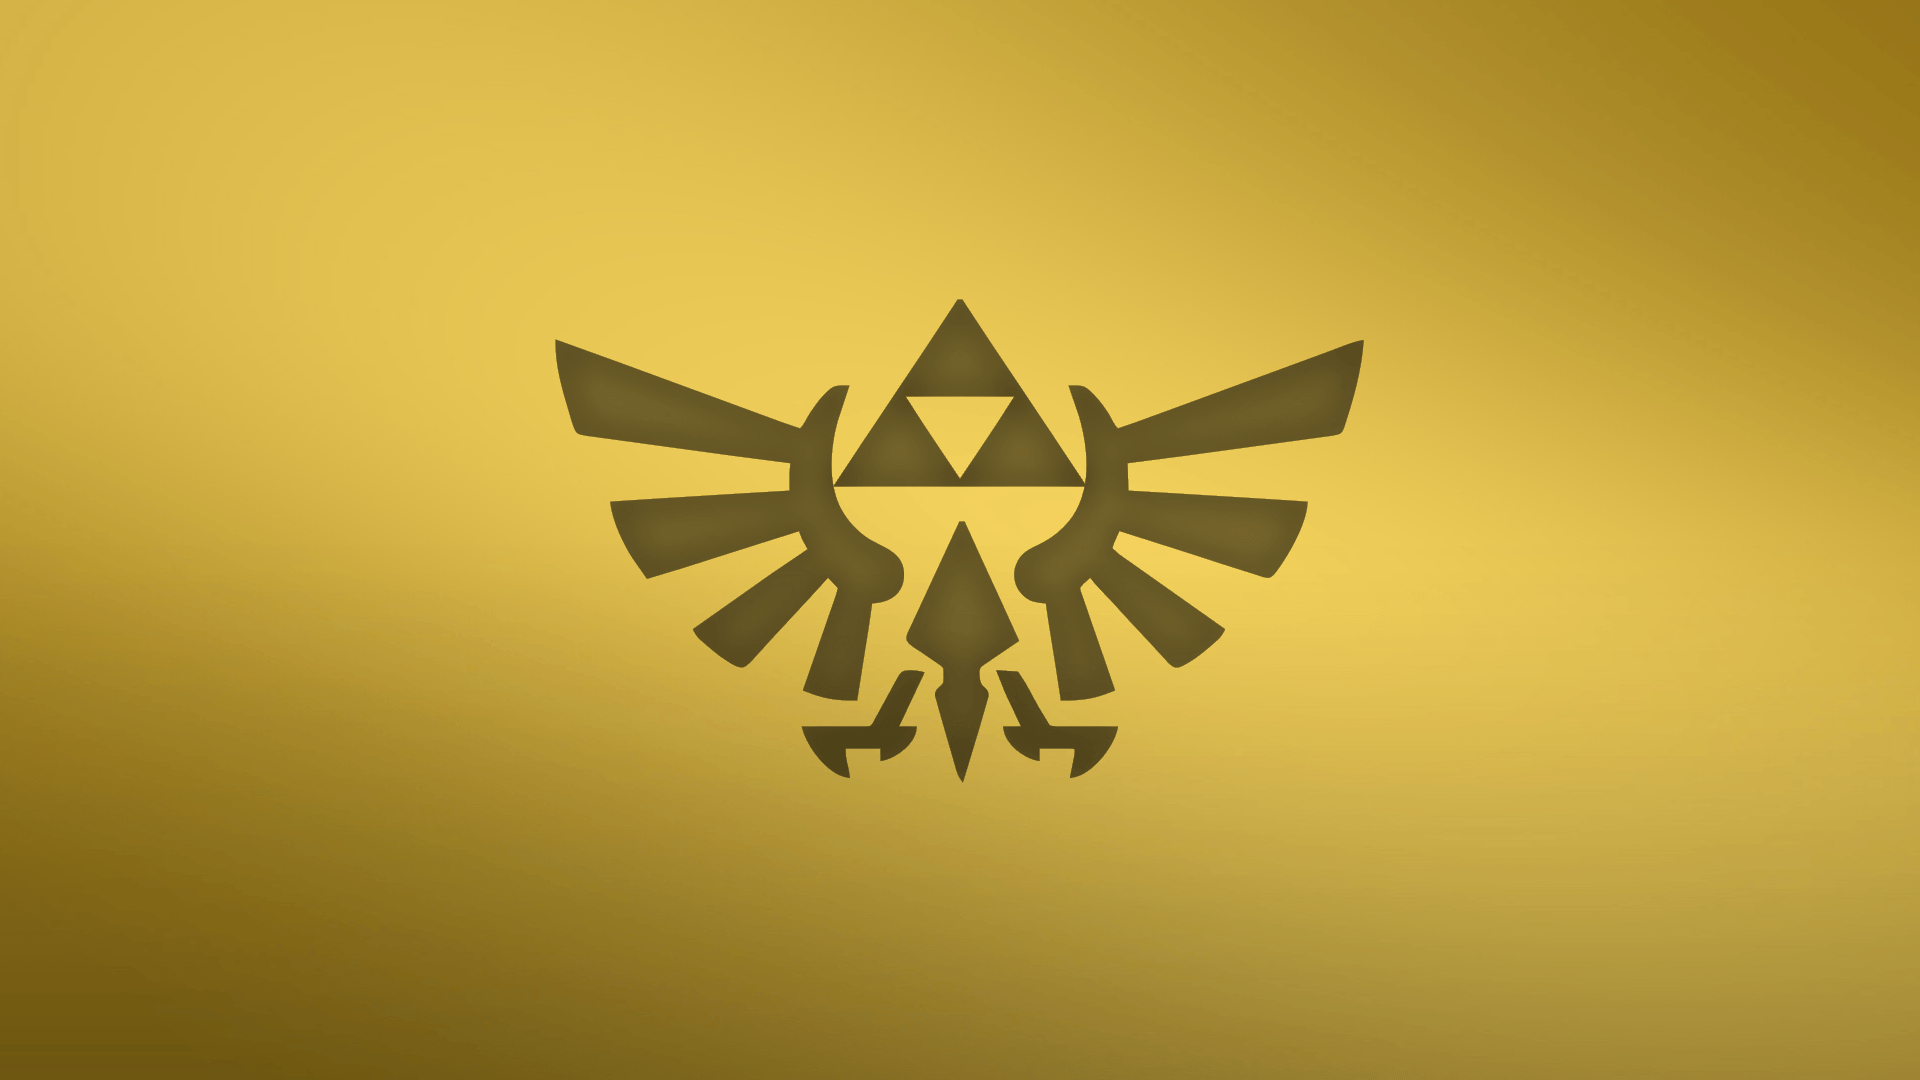 Zelda Wallpaper 1920x1080 Triforce Triforce Wallpapers - ...